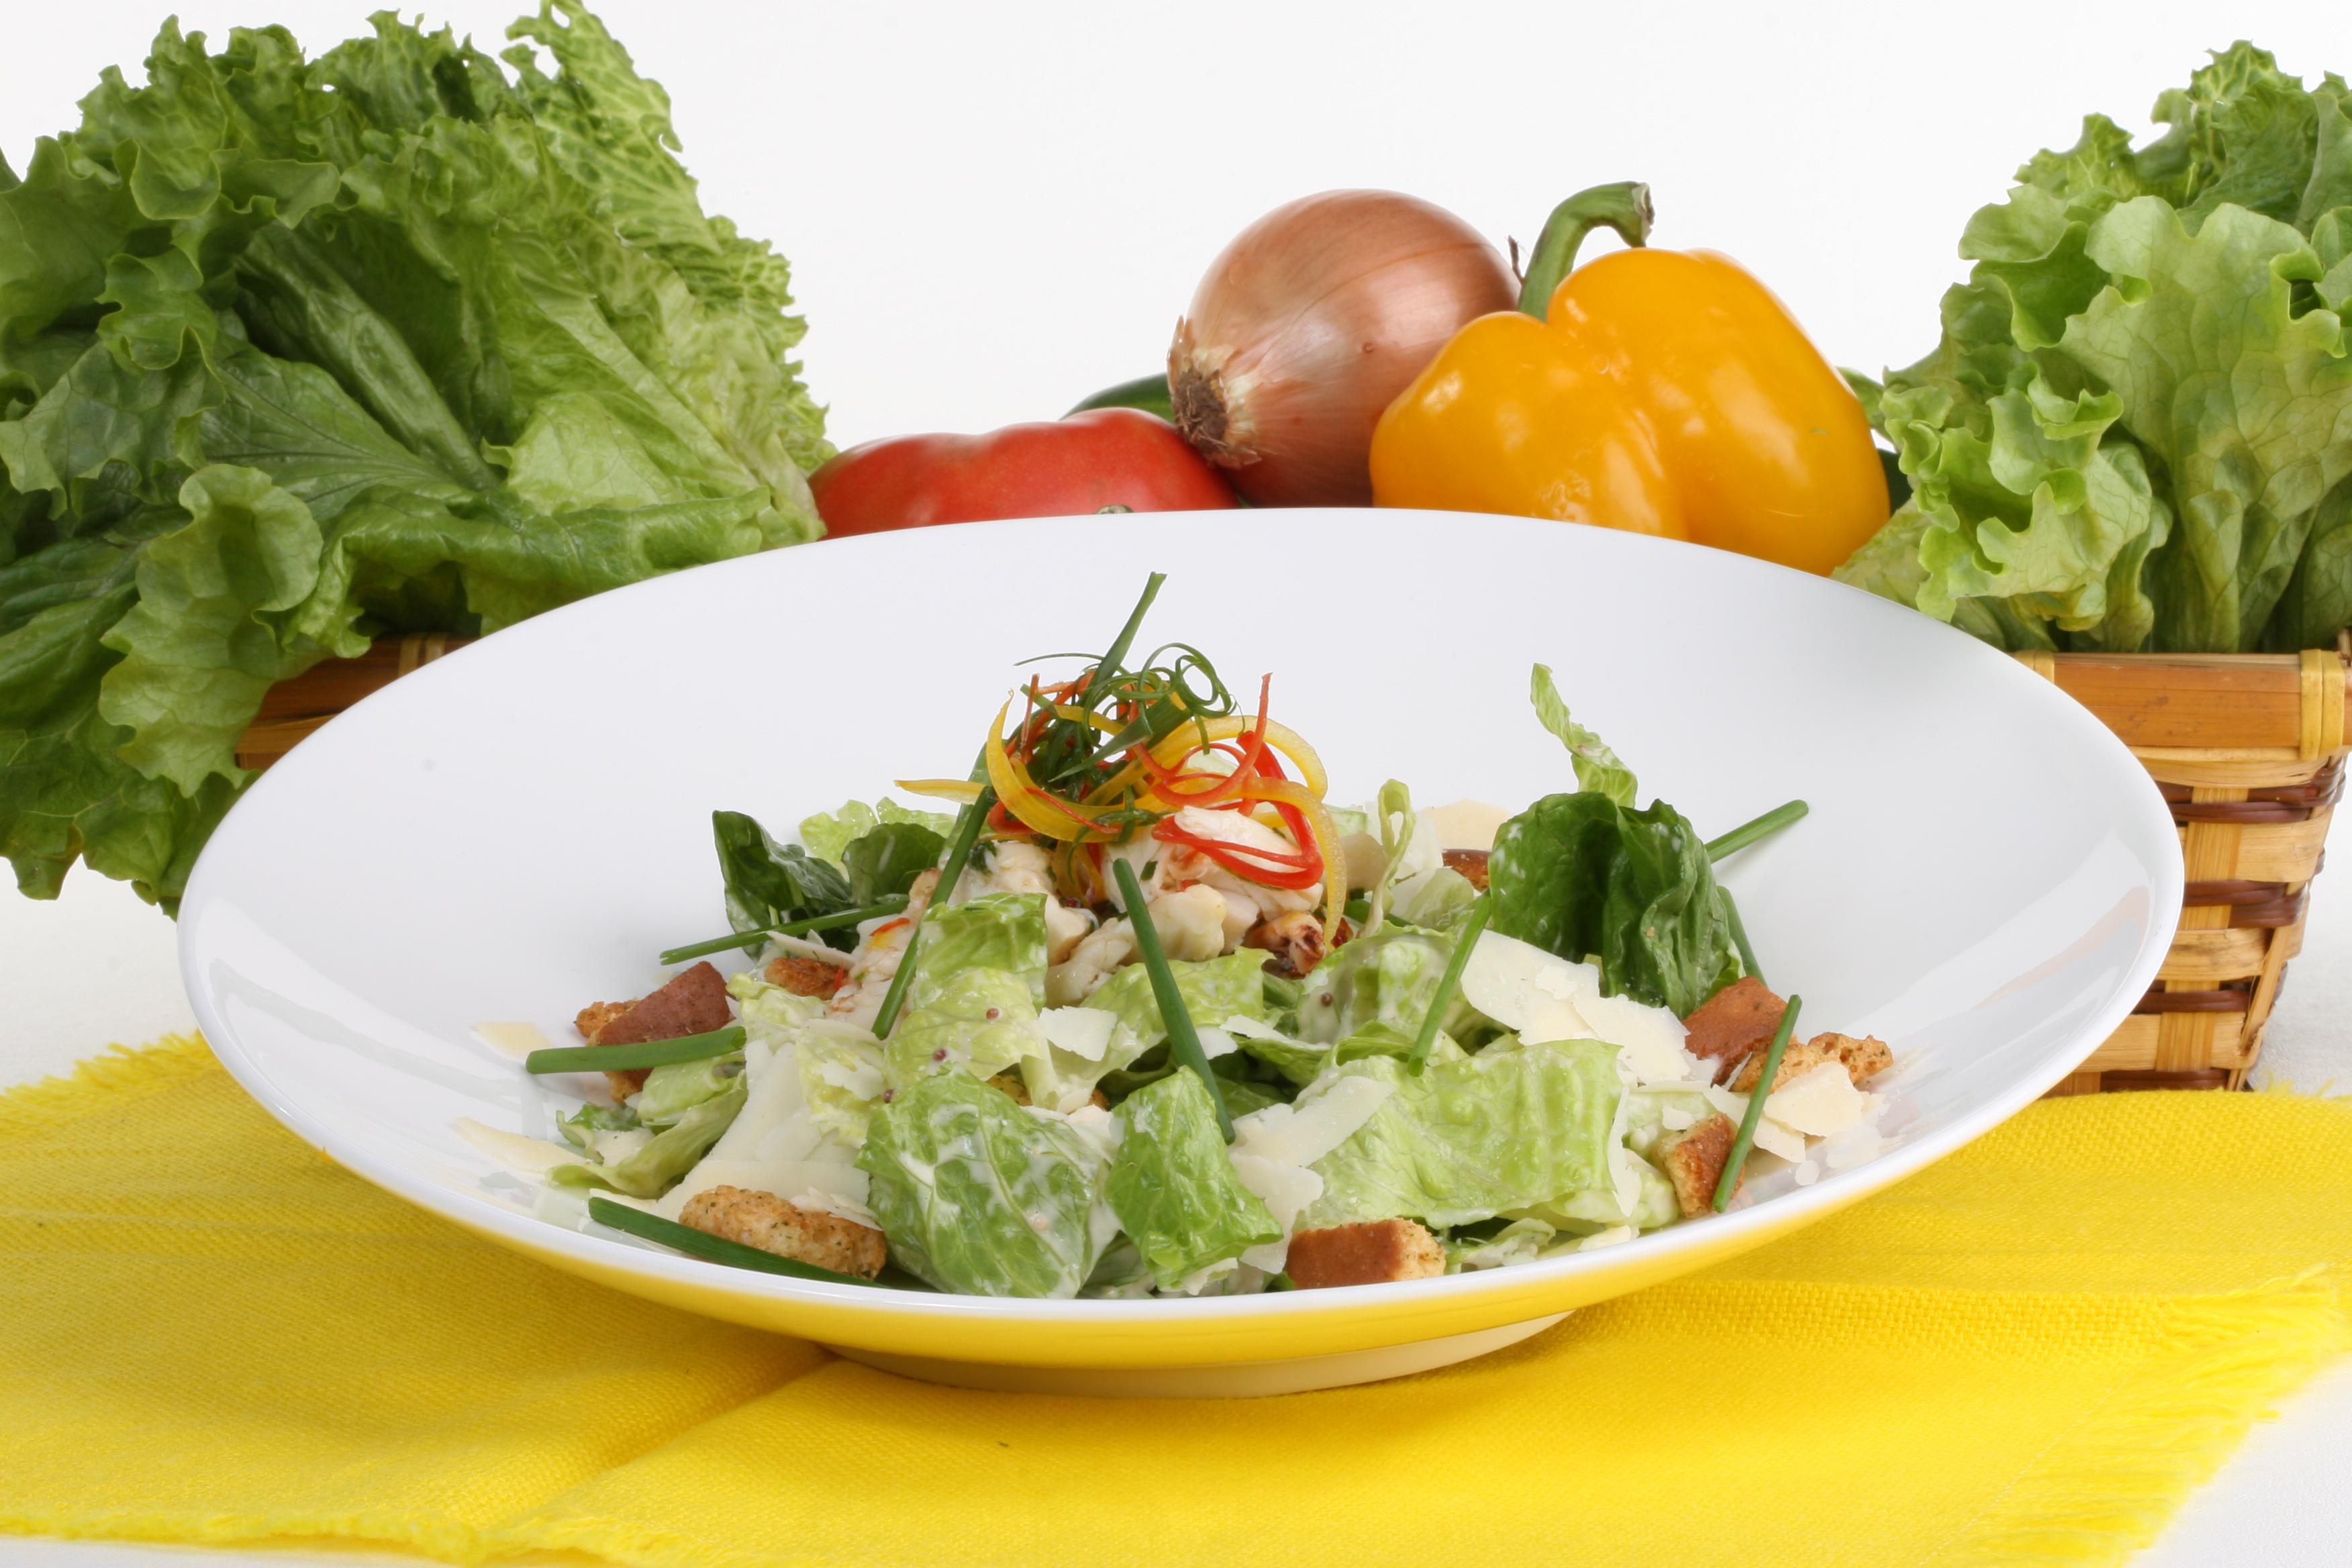 Marinated Radish and Cucumber Salad